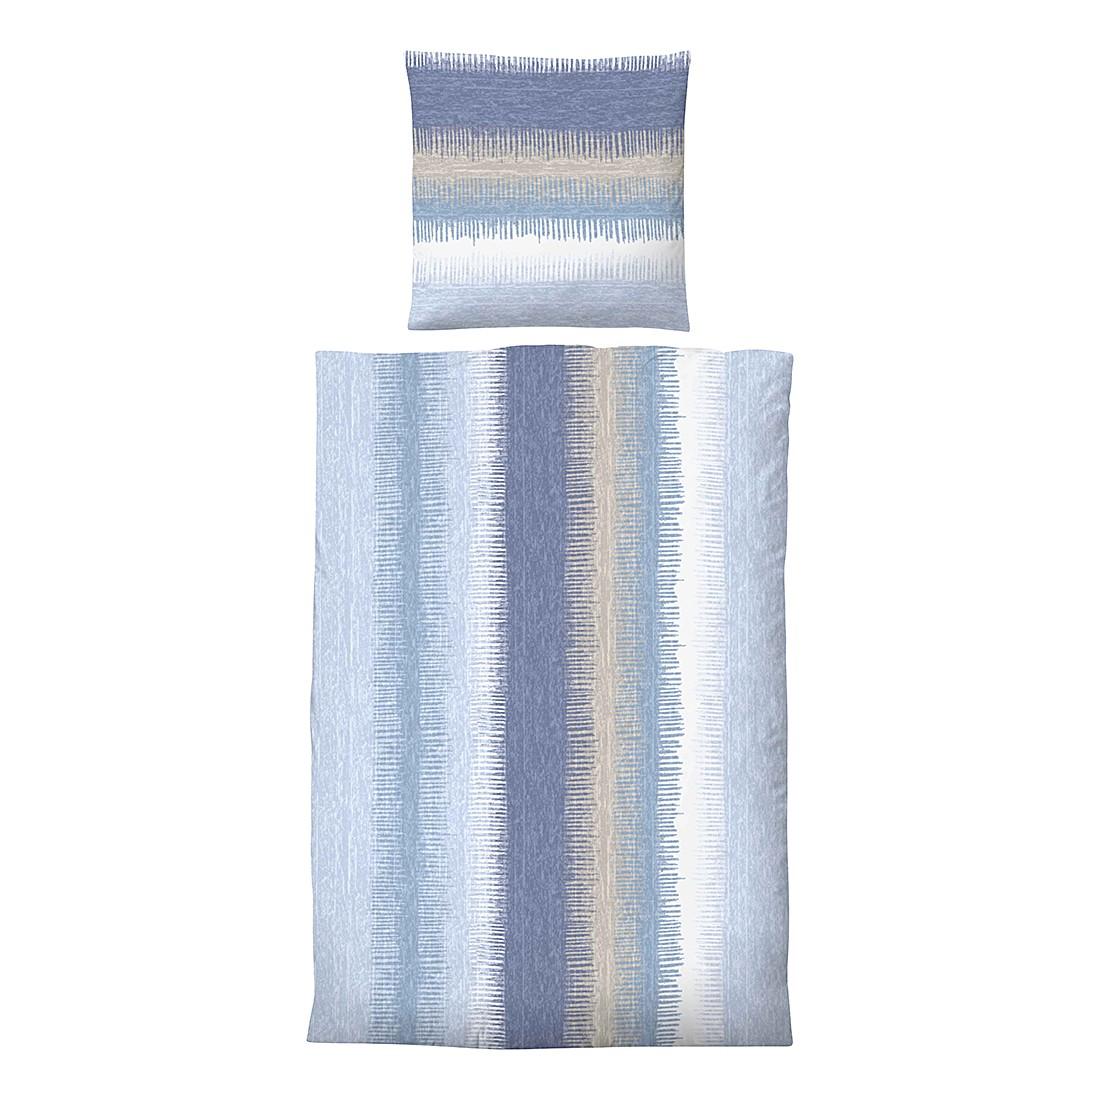 Komfort-Biber-Bettwäsche Susann – Blau – 135 x 200 cm + Kissen 80 x 80 cm, Biberna günstig